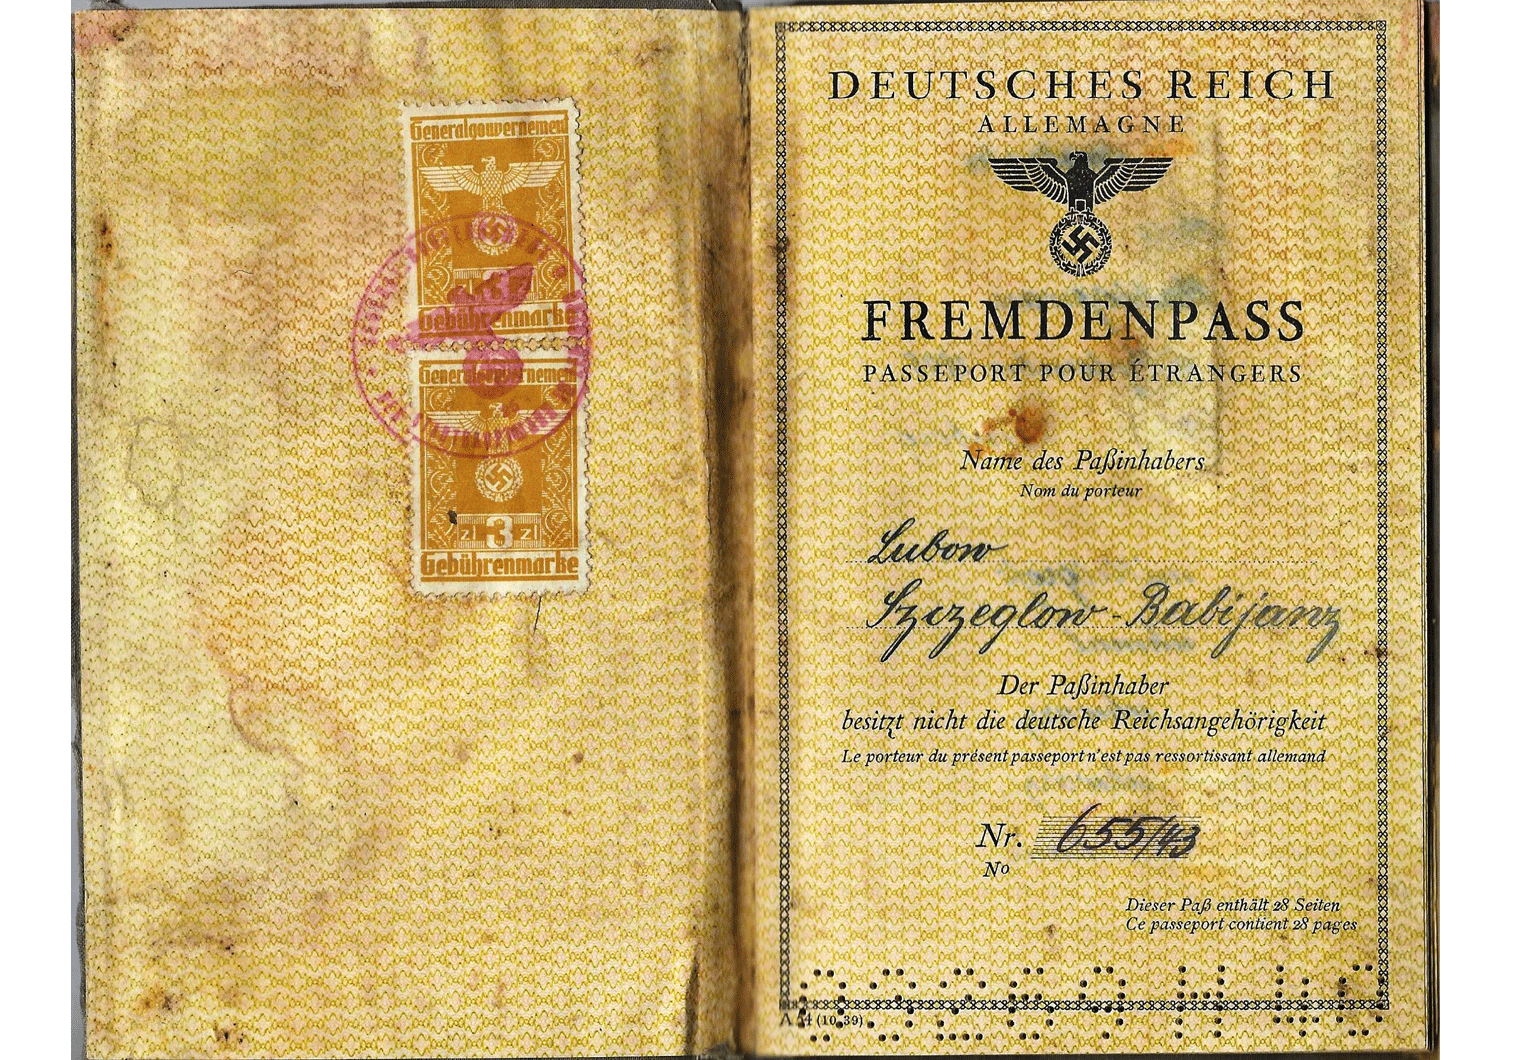 German issued foreigner-passports